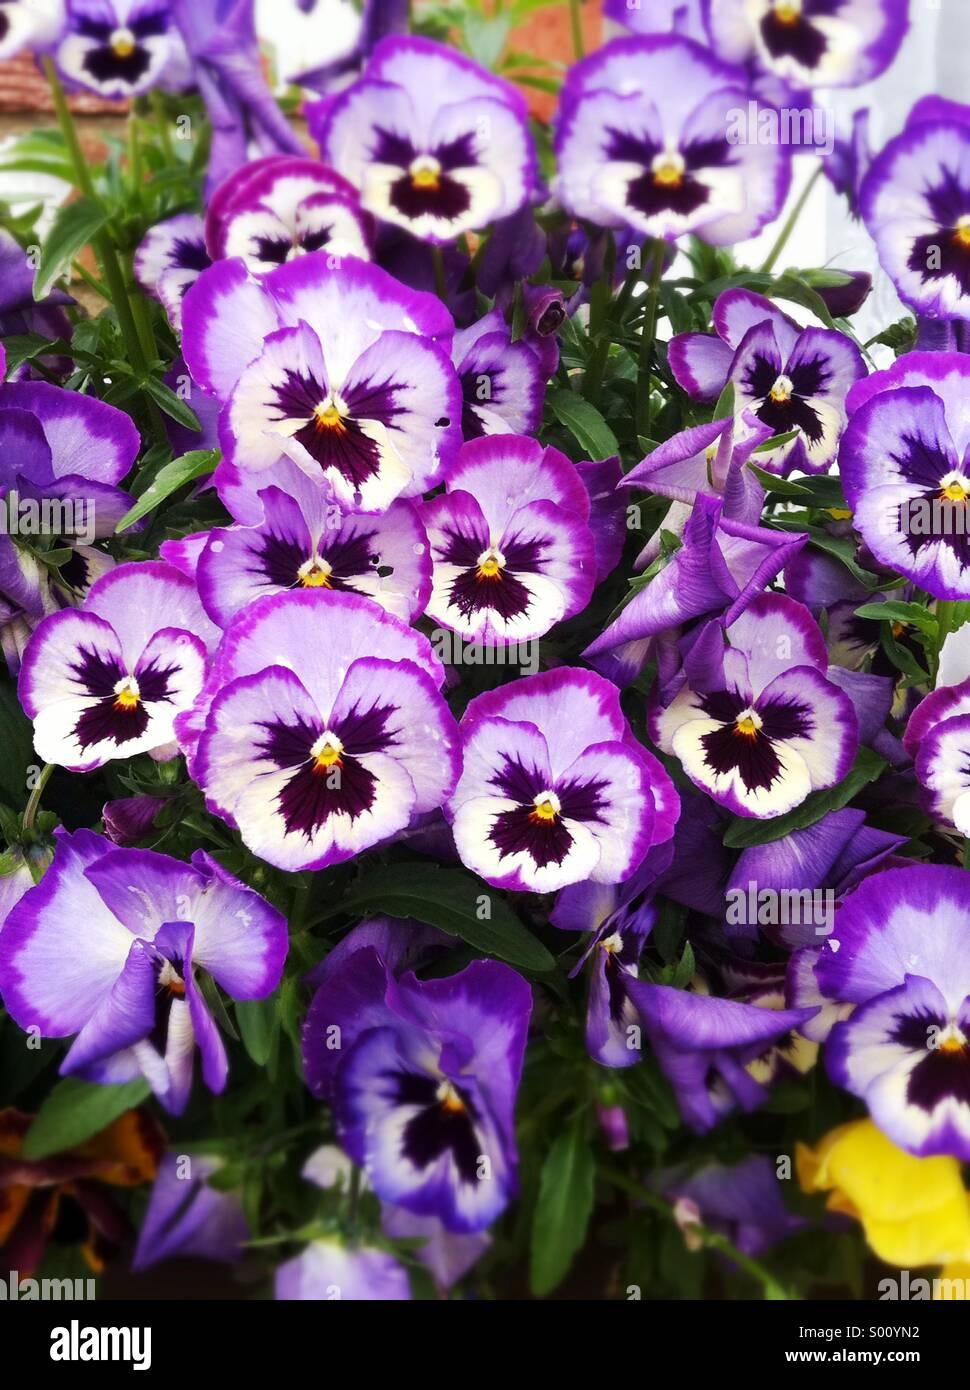 Purple pansy flowers - Stock Image